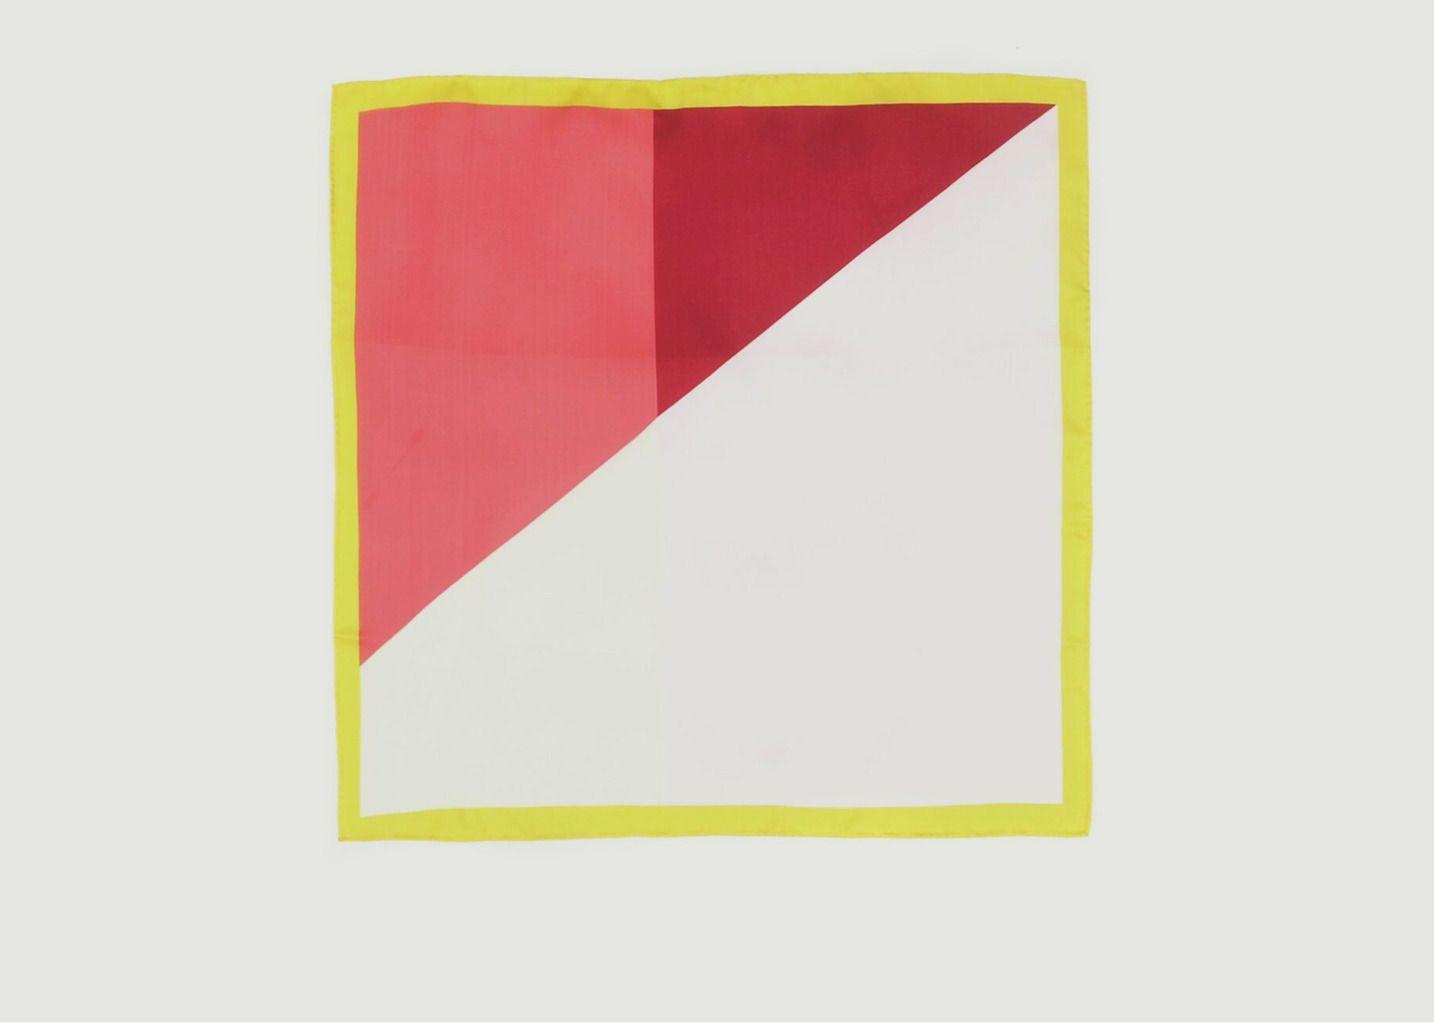 Foulard carré en soie n°397 - Moismont